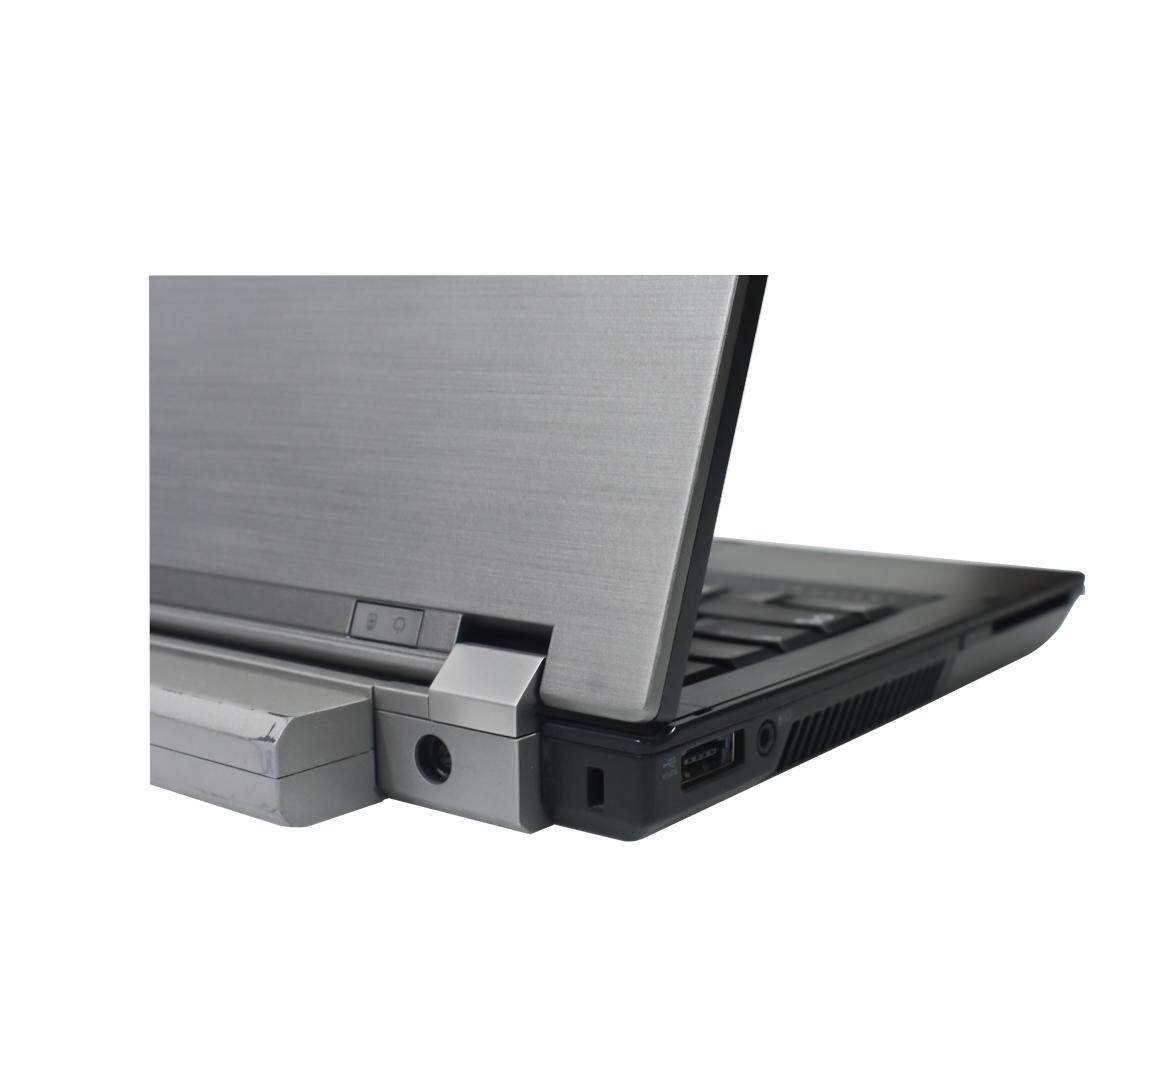 Dell Latitude E4310 Business Laptop, Intel Core i5-M540 CPU, 8GB DDR3 SODIMM RAM, 500GB SATA 2.5 Hard, 13 inch Display (Refurbished)